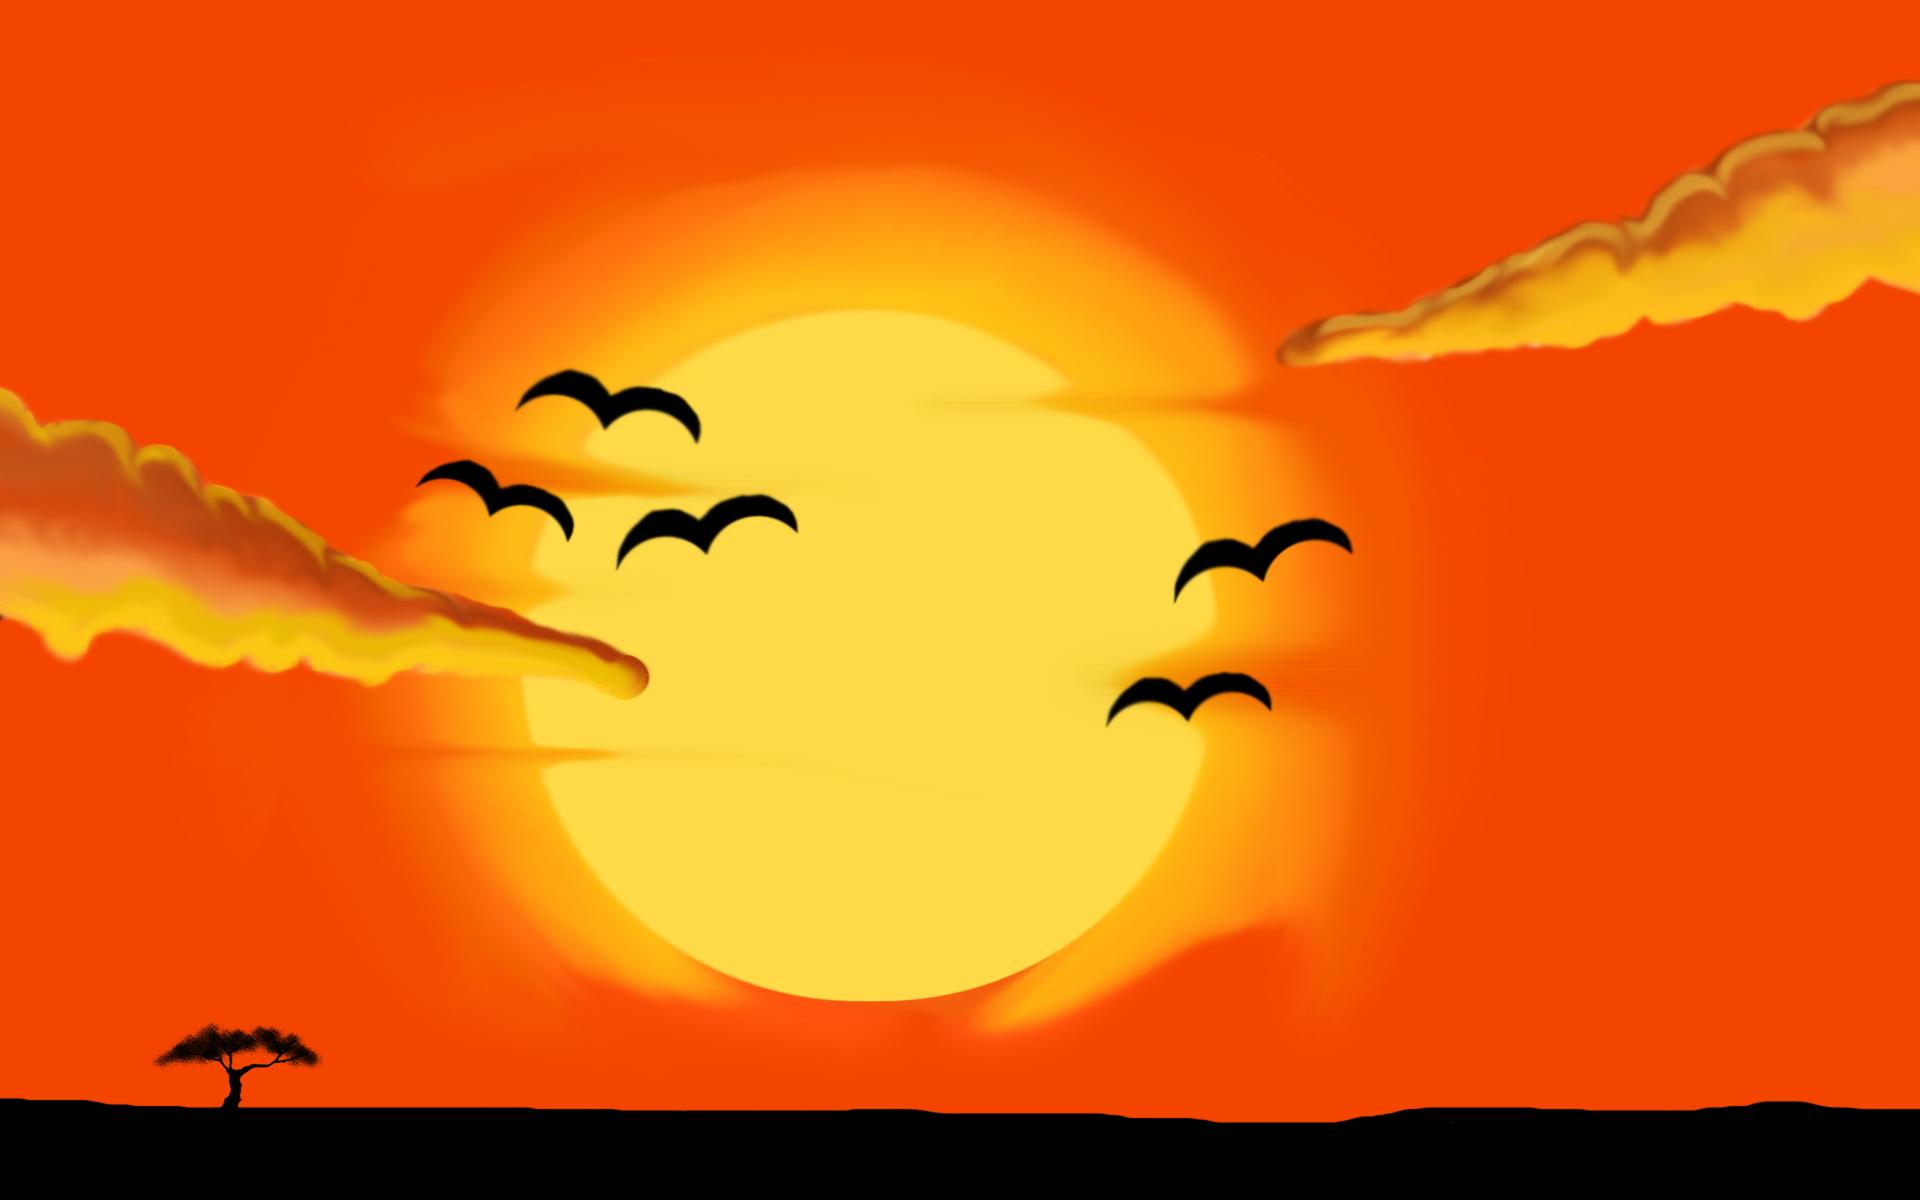 Sunrise by larabunny Sunrise by larabunny - PNG Sunrise